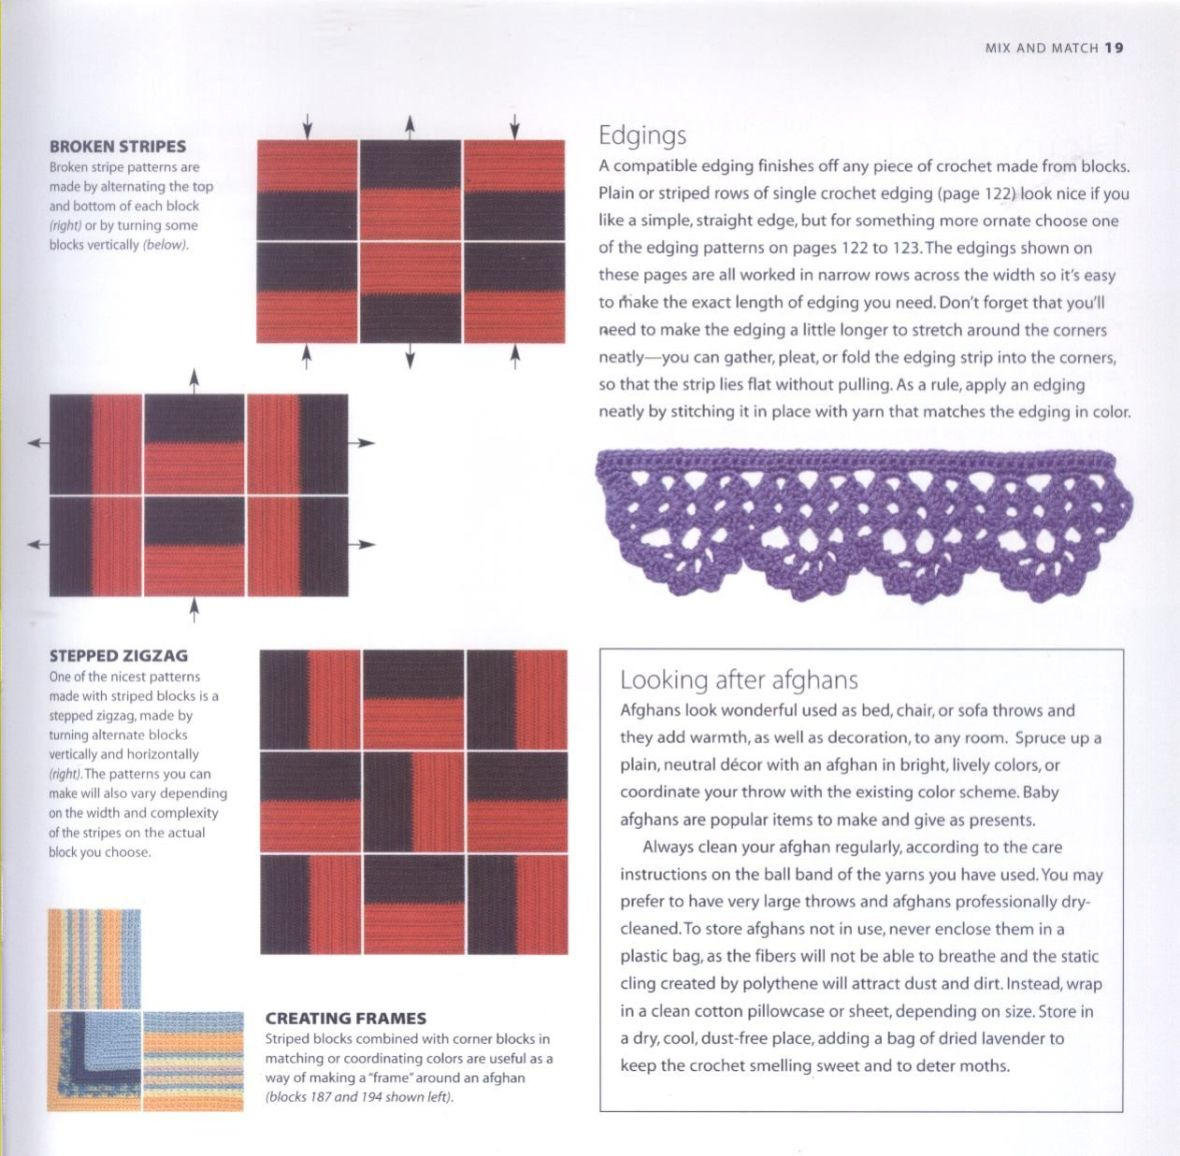 200 Crocheted Blocks for blankets, throws & Afghans 019